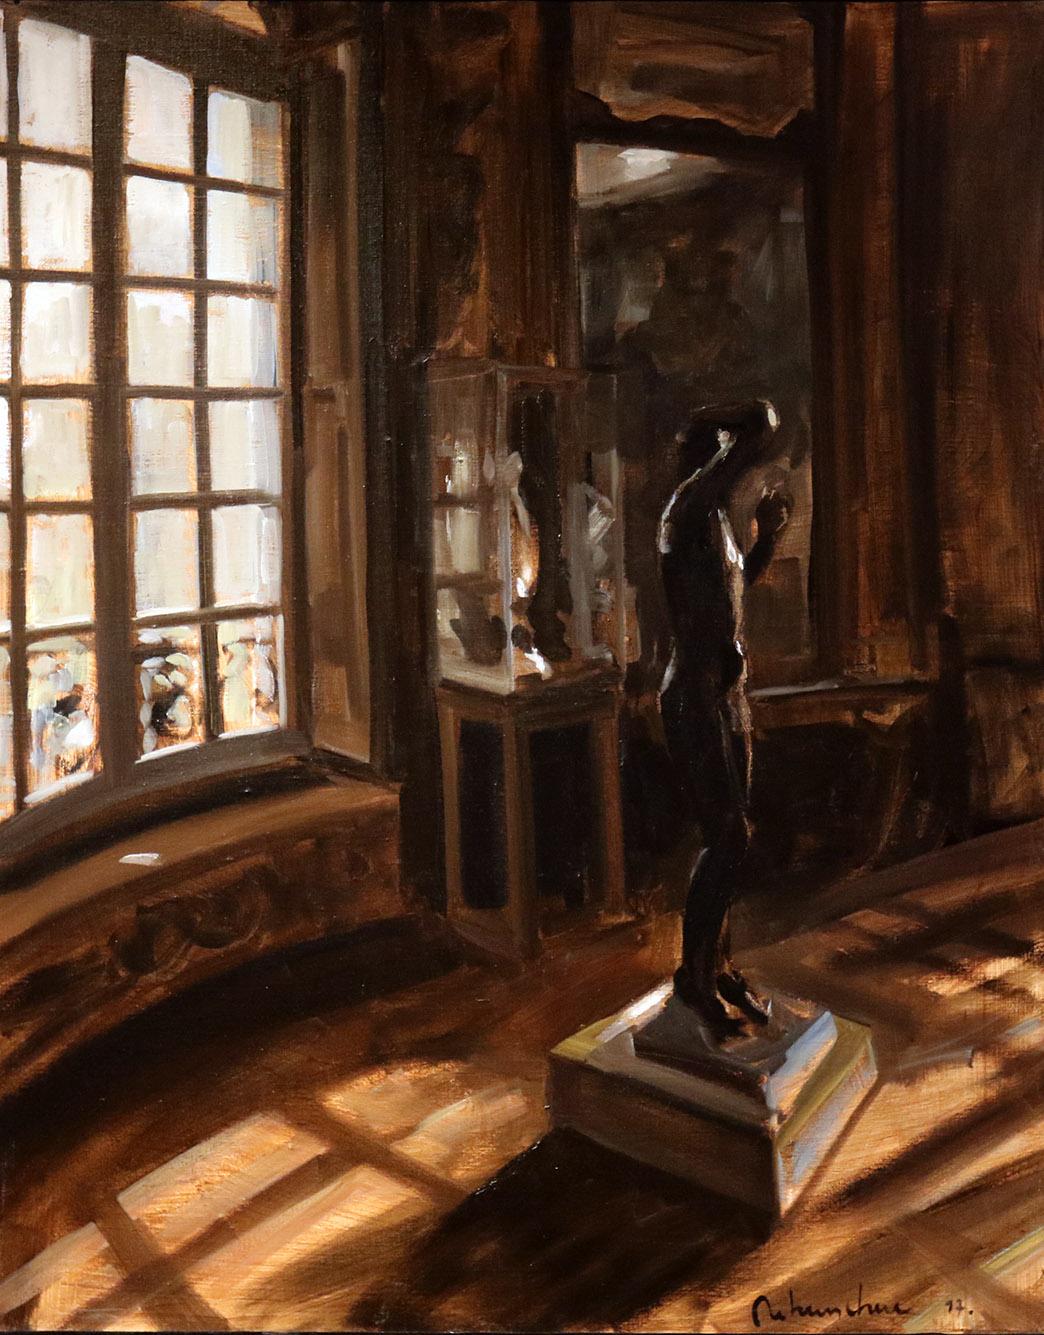 Christoff DEBUSSCHERE - 71 - Au Musée Rodin 1 - 30F (92X73 cm)